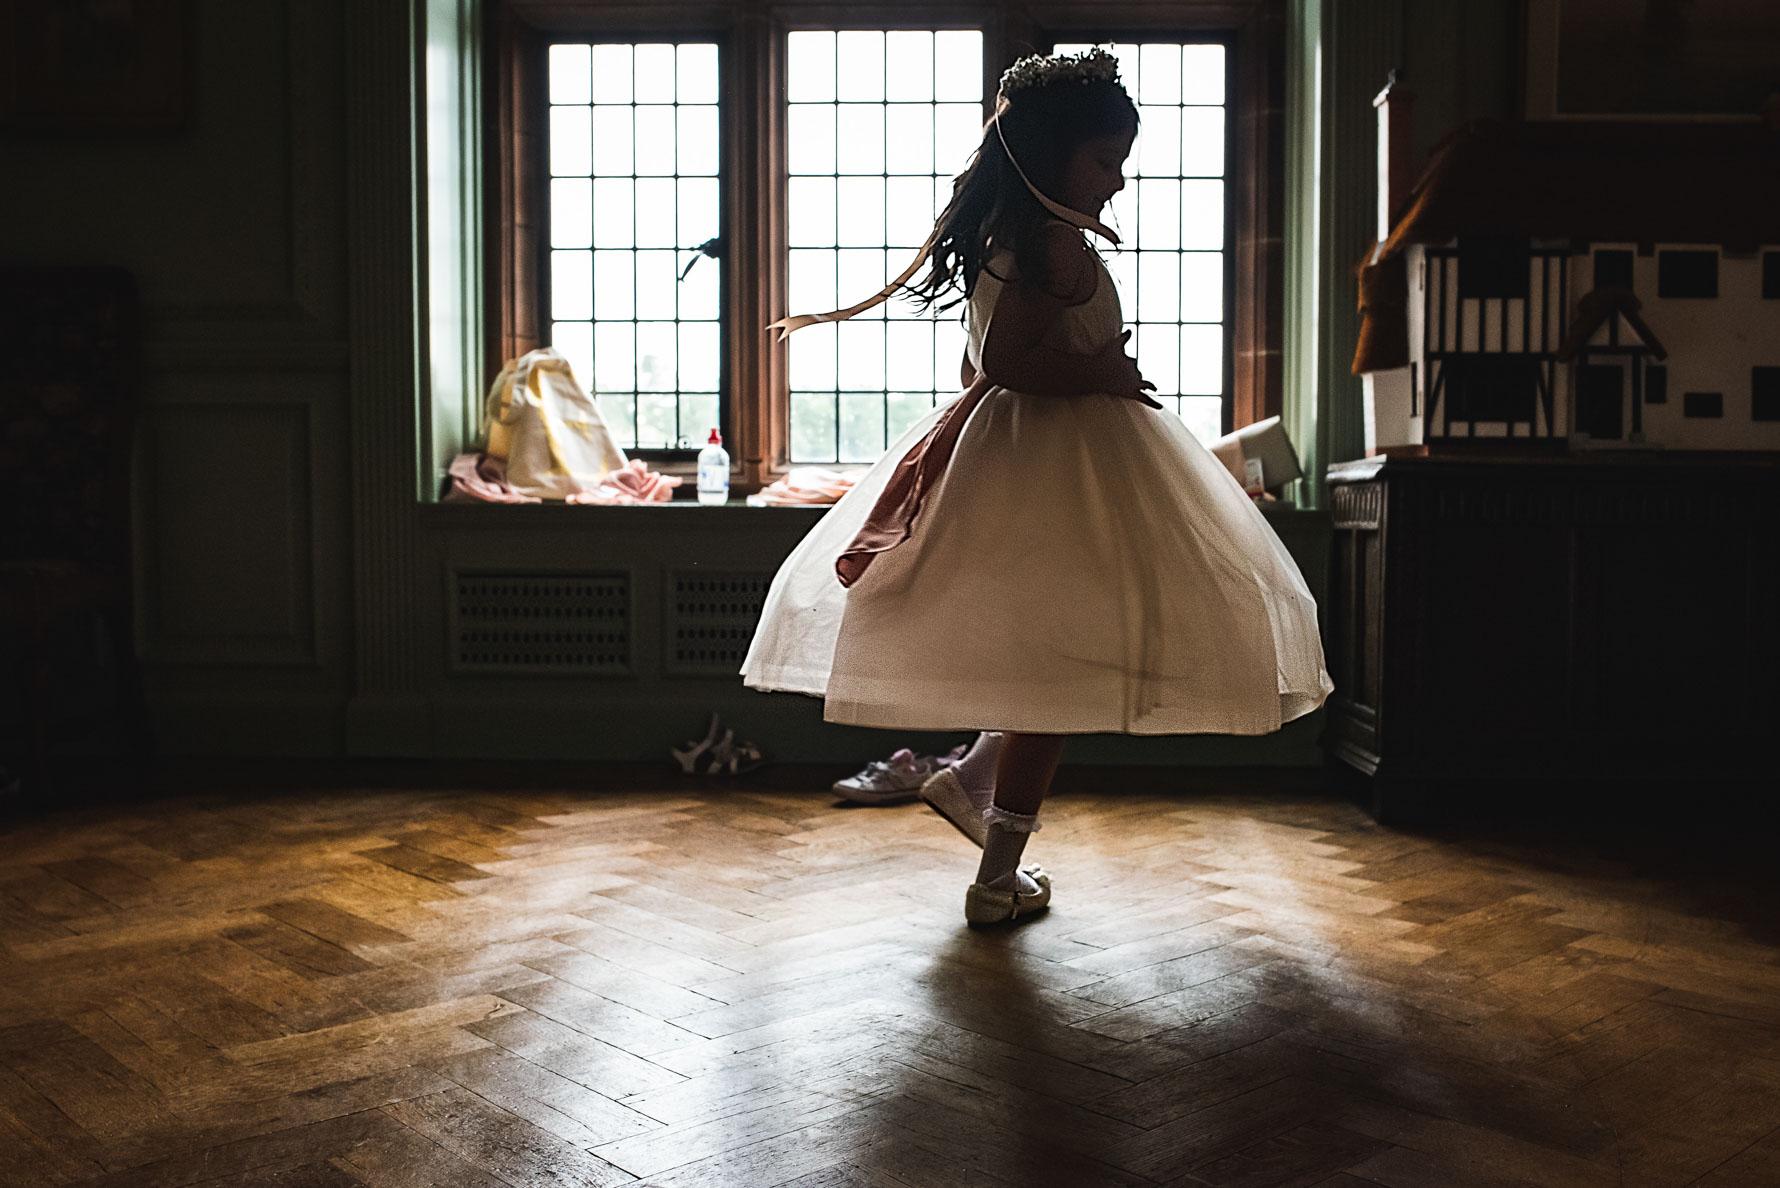 Flower girl dancing in wedding venue